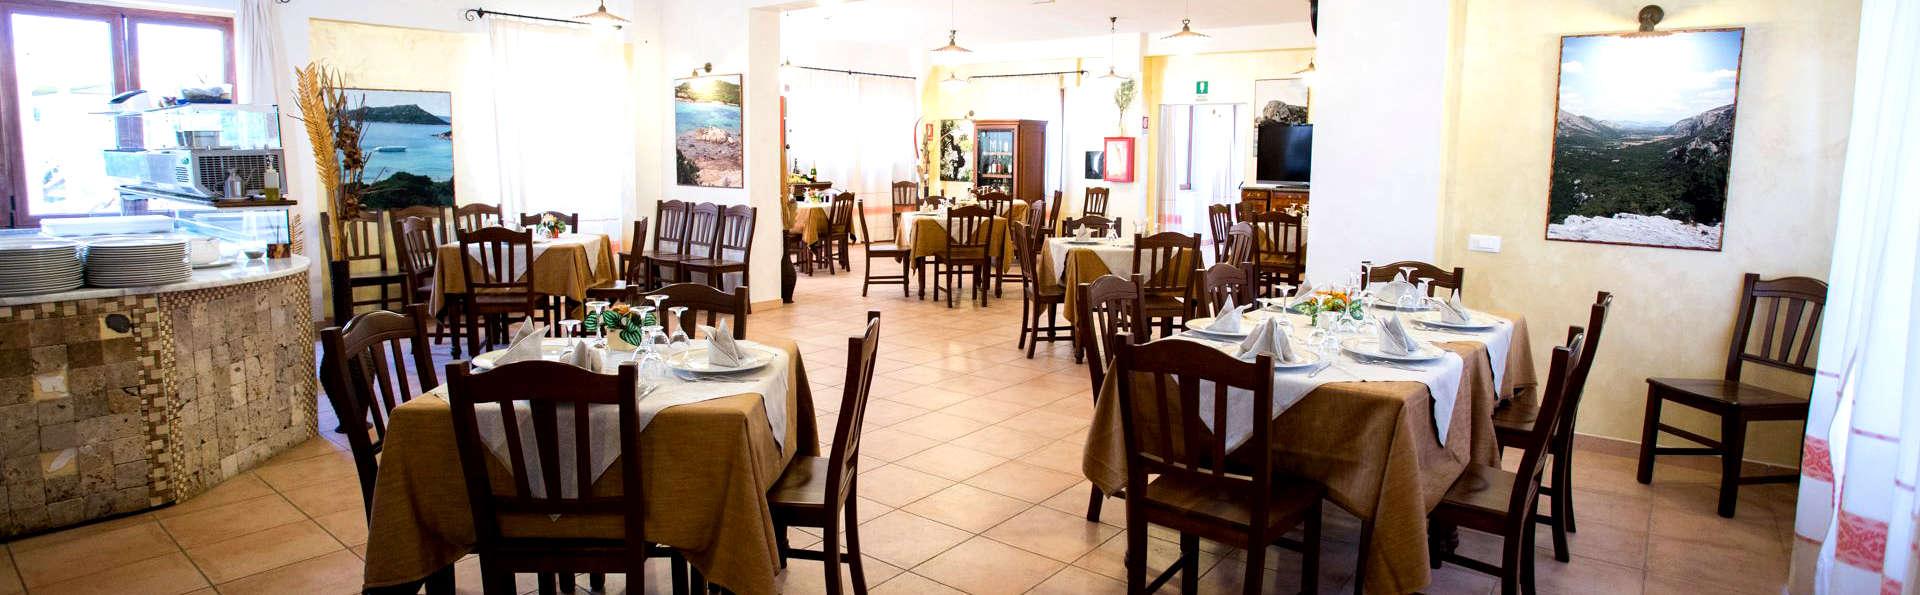 Bellamarina - Edit_Restaurant.jpg